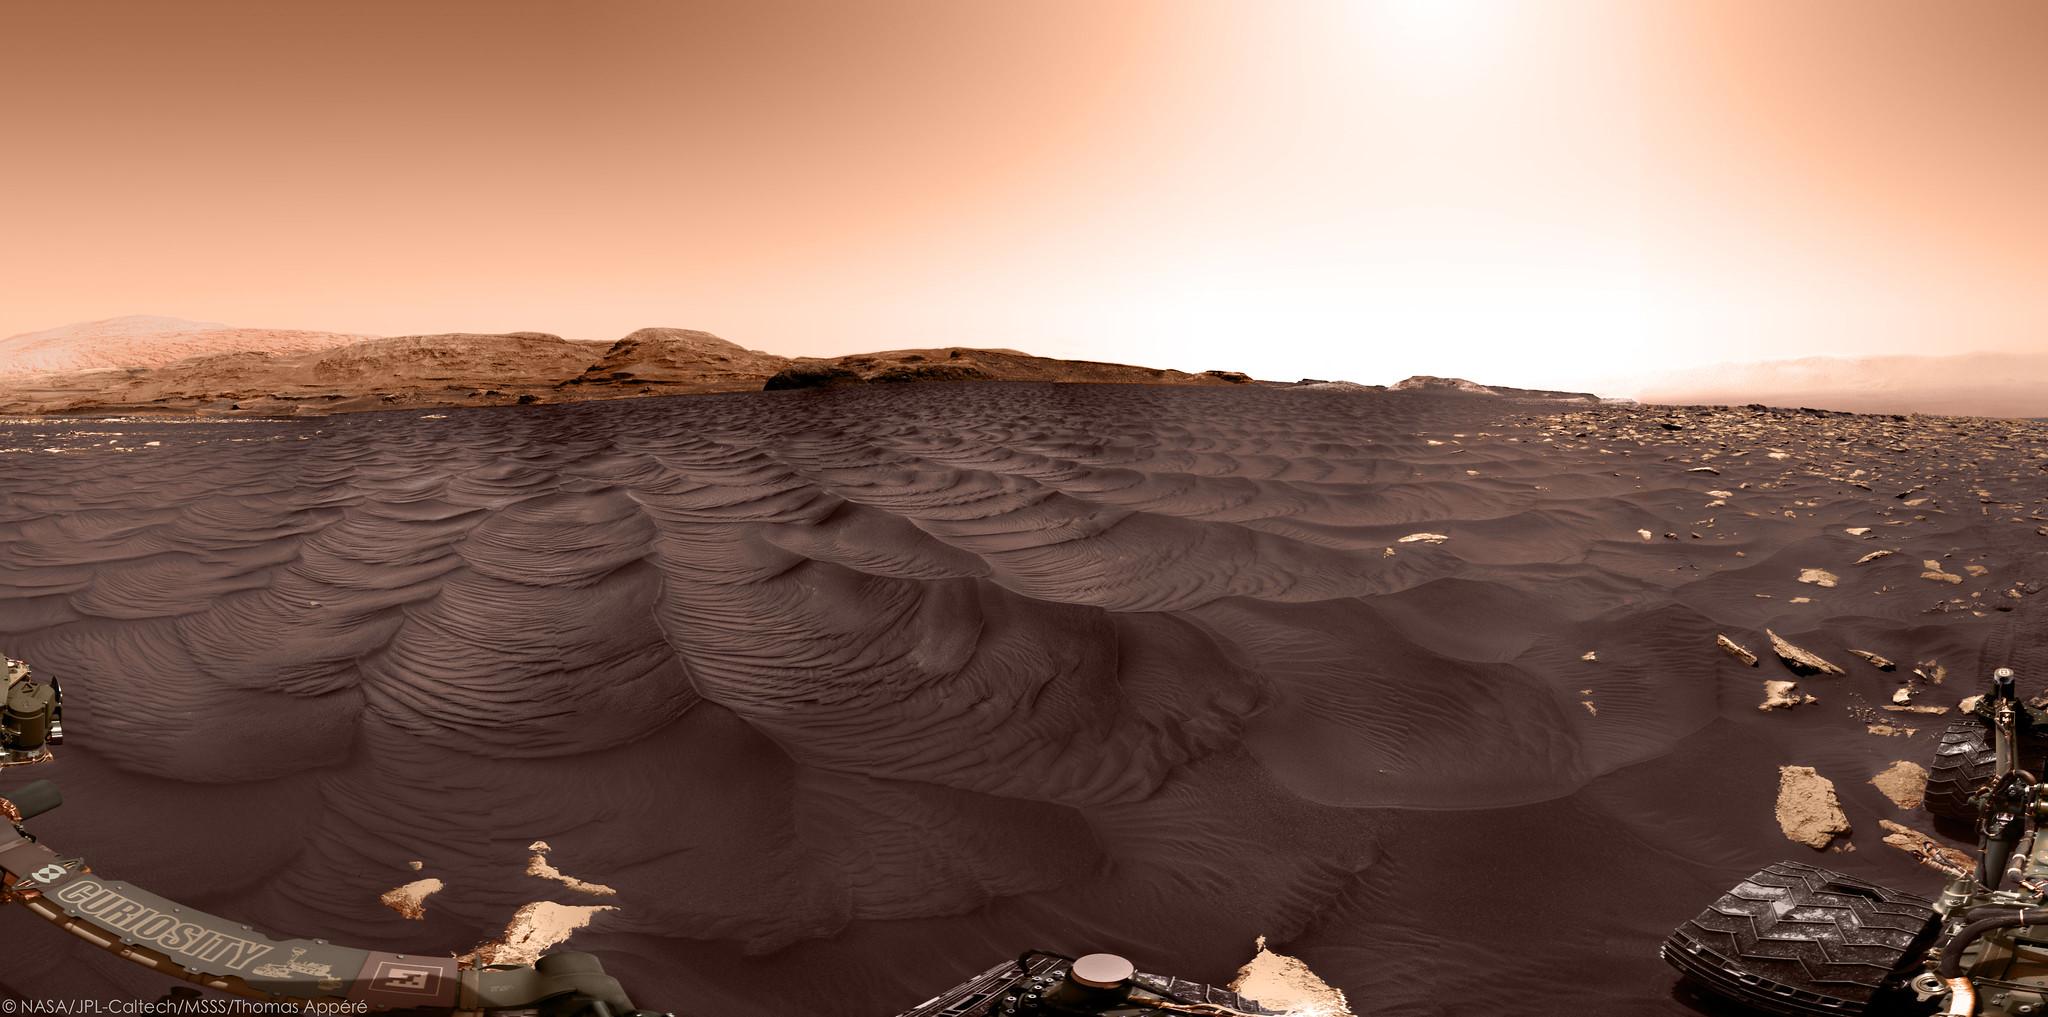 [Curiosity/MSL] L'exploration du cratère Gale (3/3) - Page 6 ErULQMNXUAAbafK?format=jpg&name=large